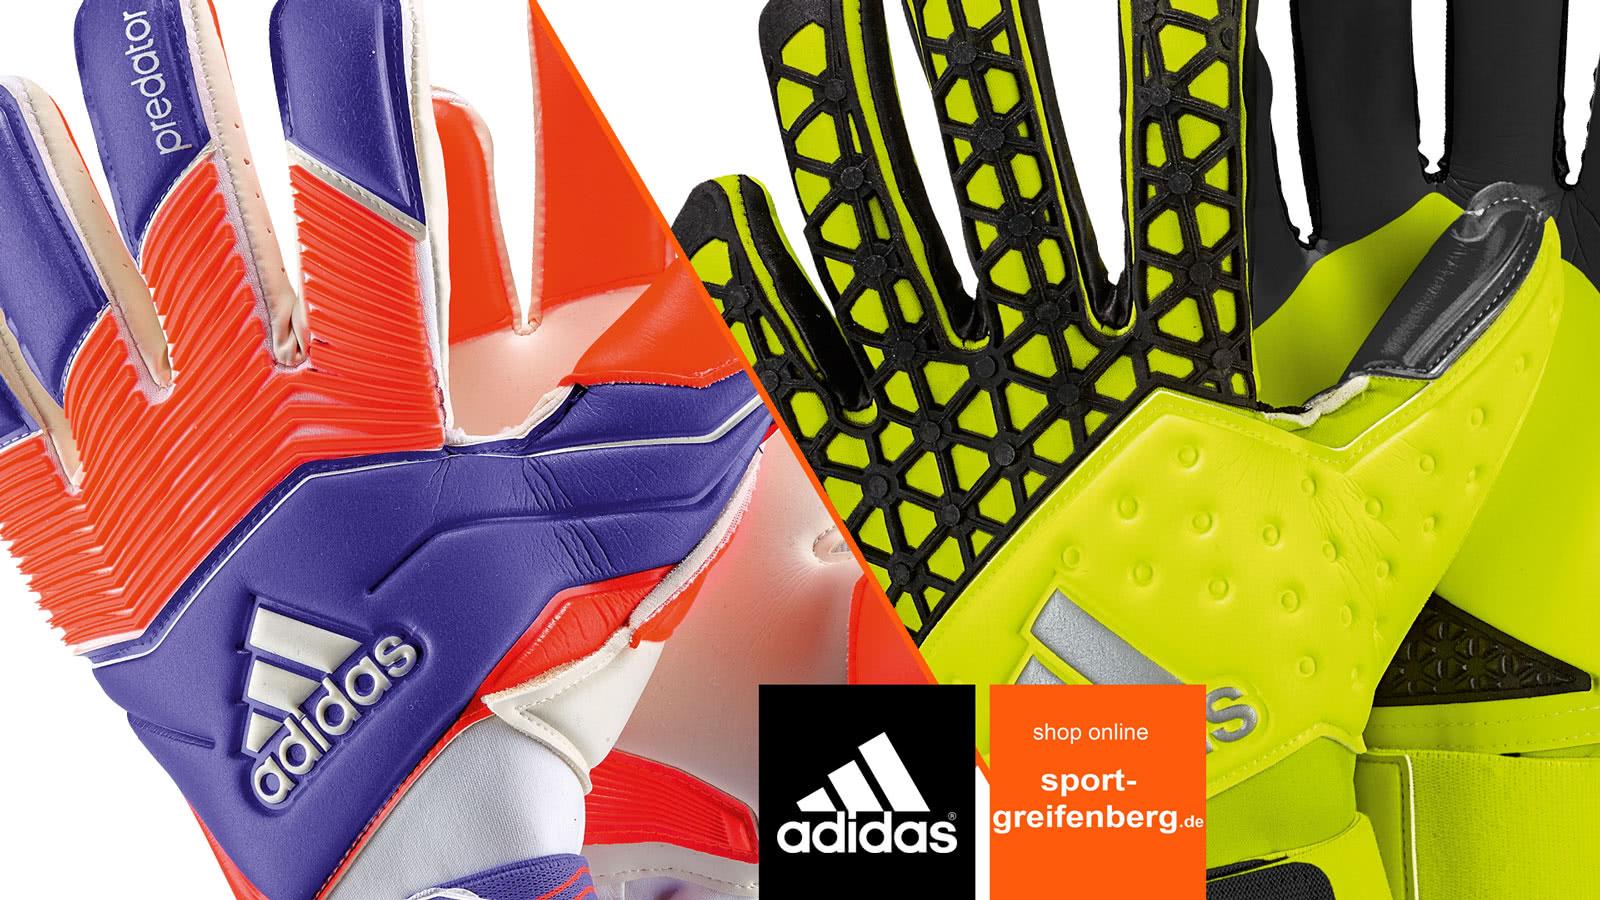 Adidas Ace Zones Torwarthandschuhe